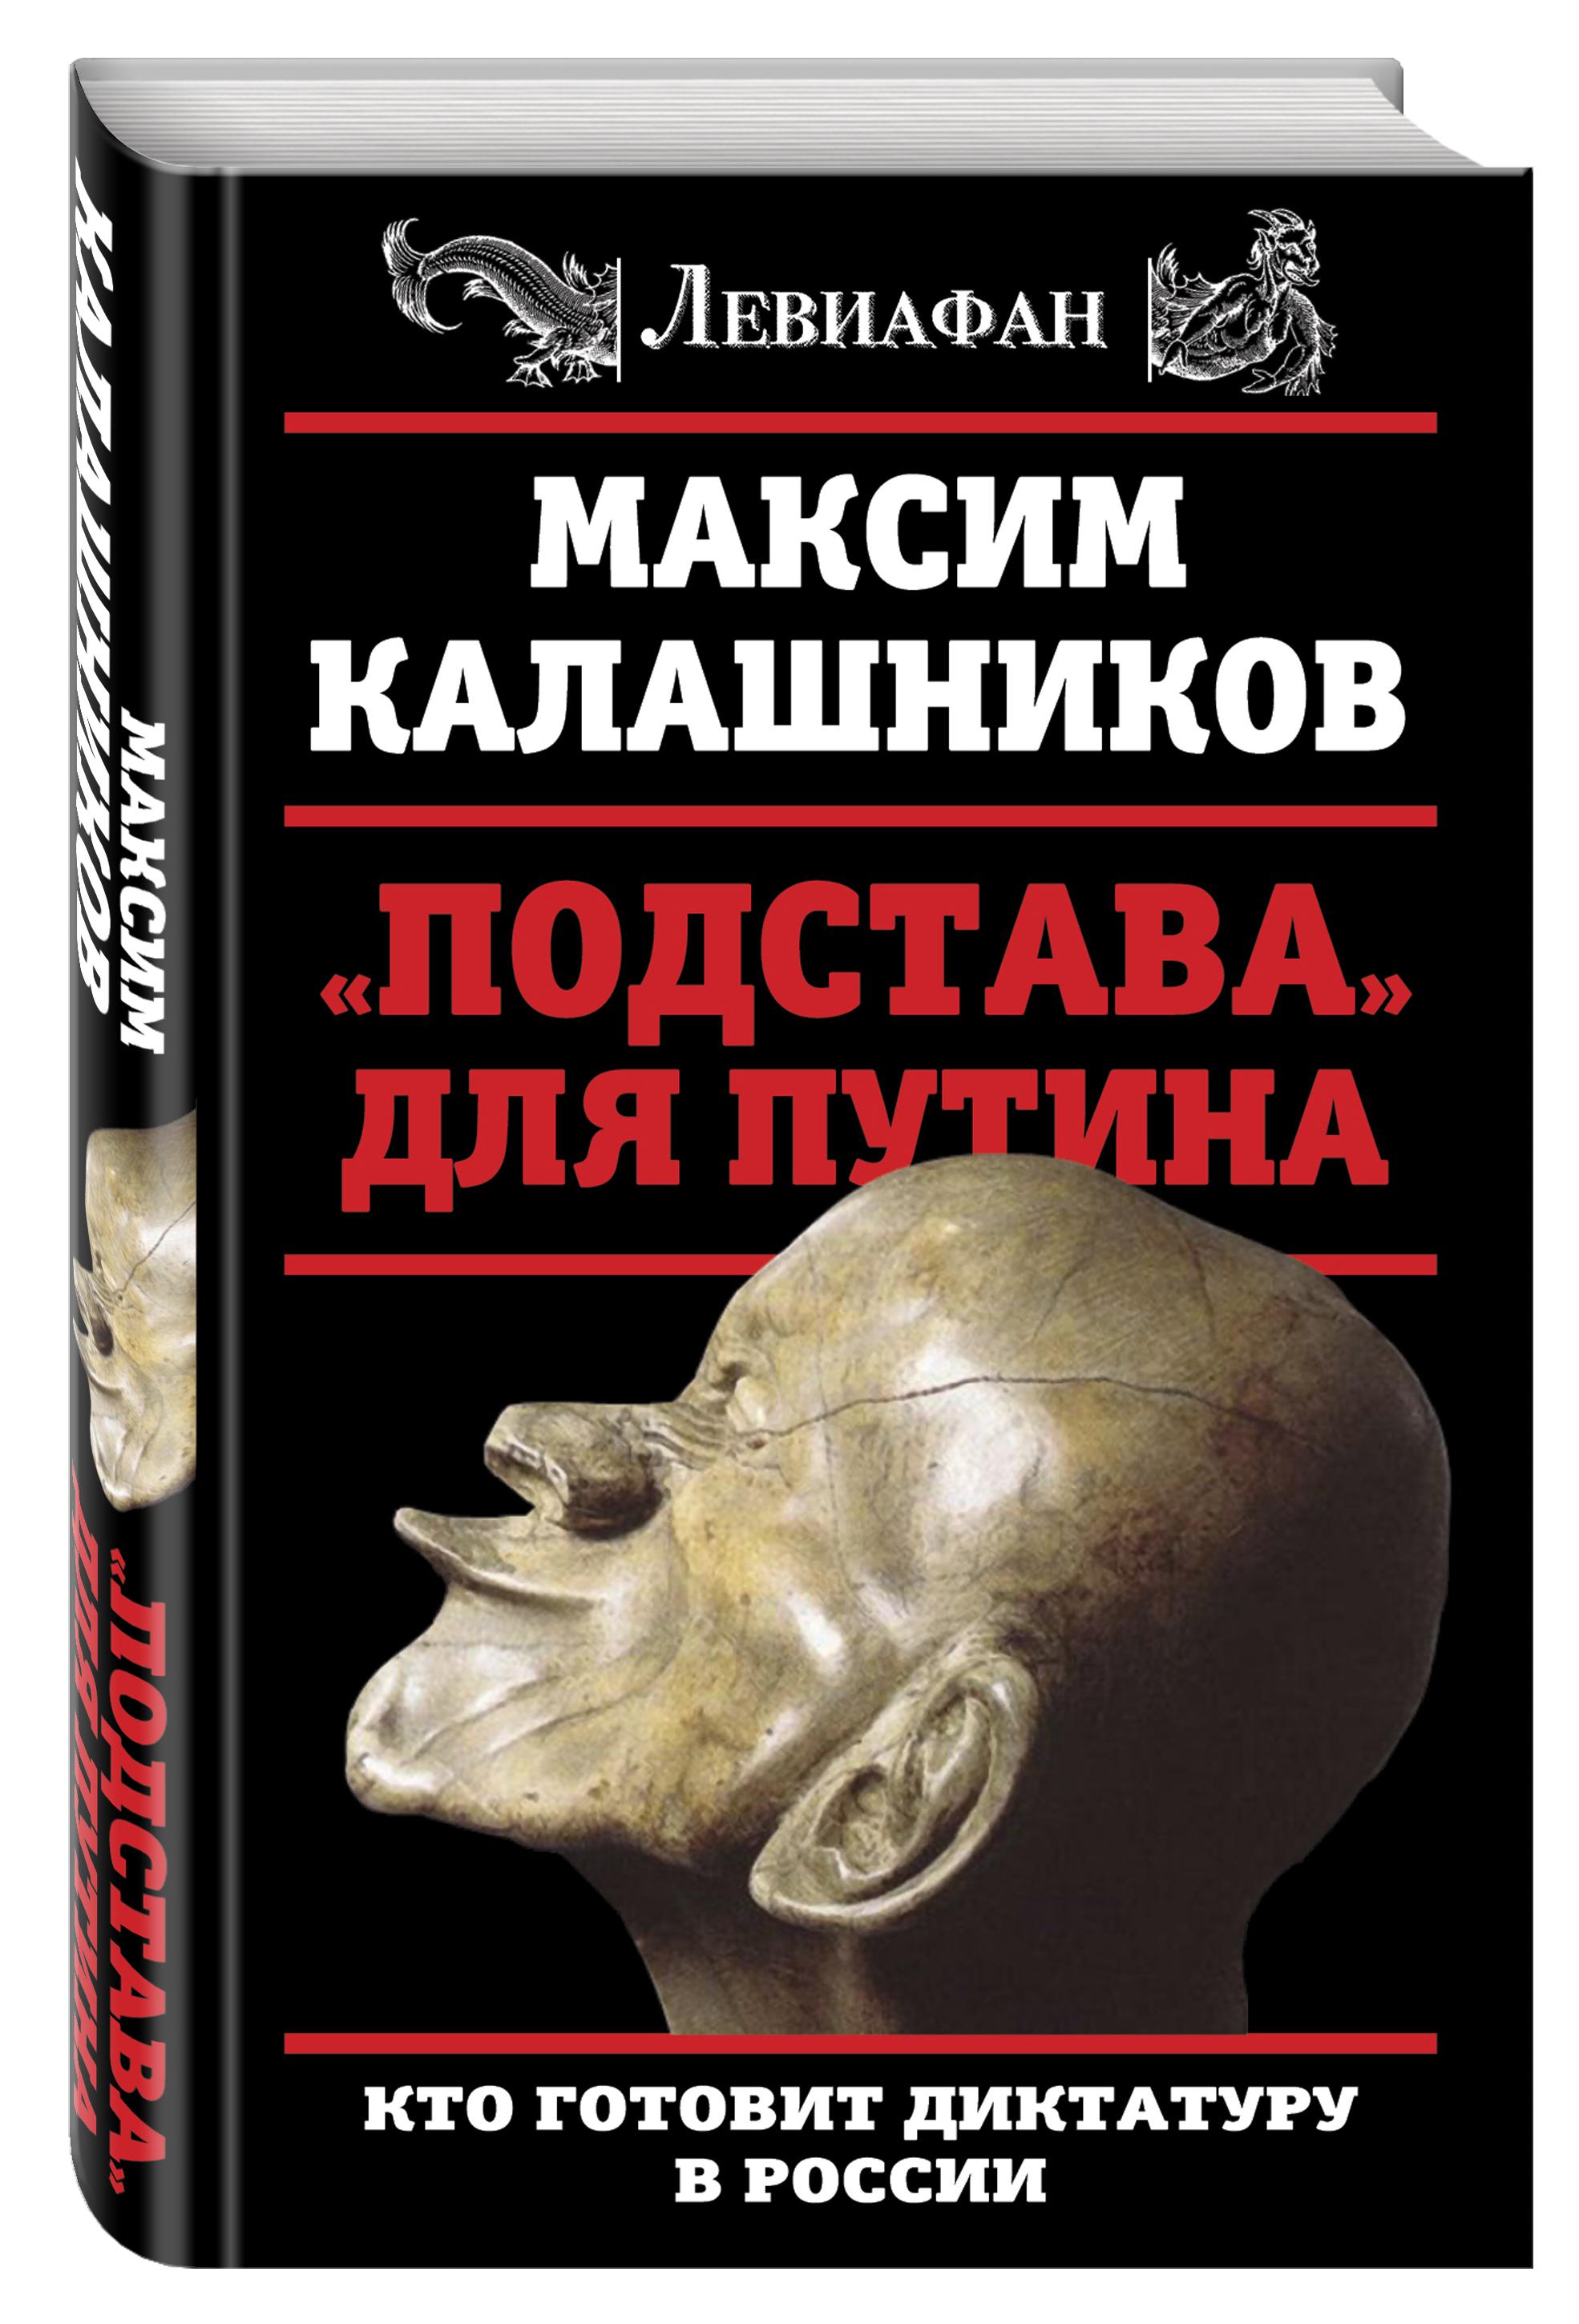 «Подстава» для Путина. Кто готовит диктатуру в России от book24.ru